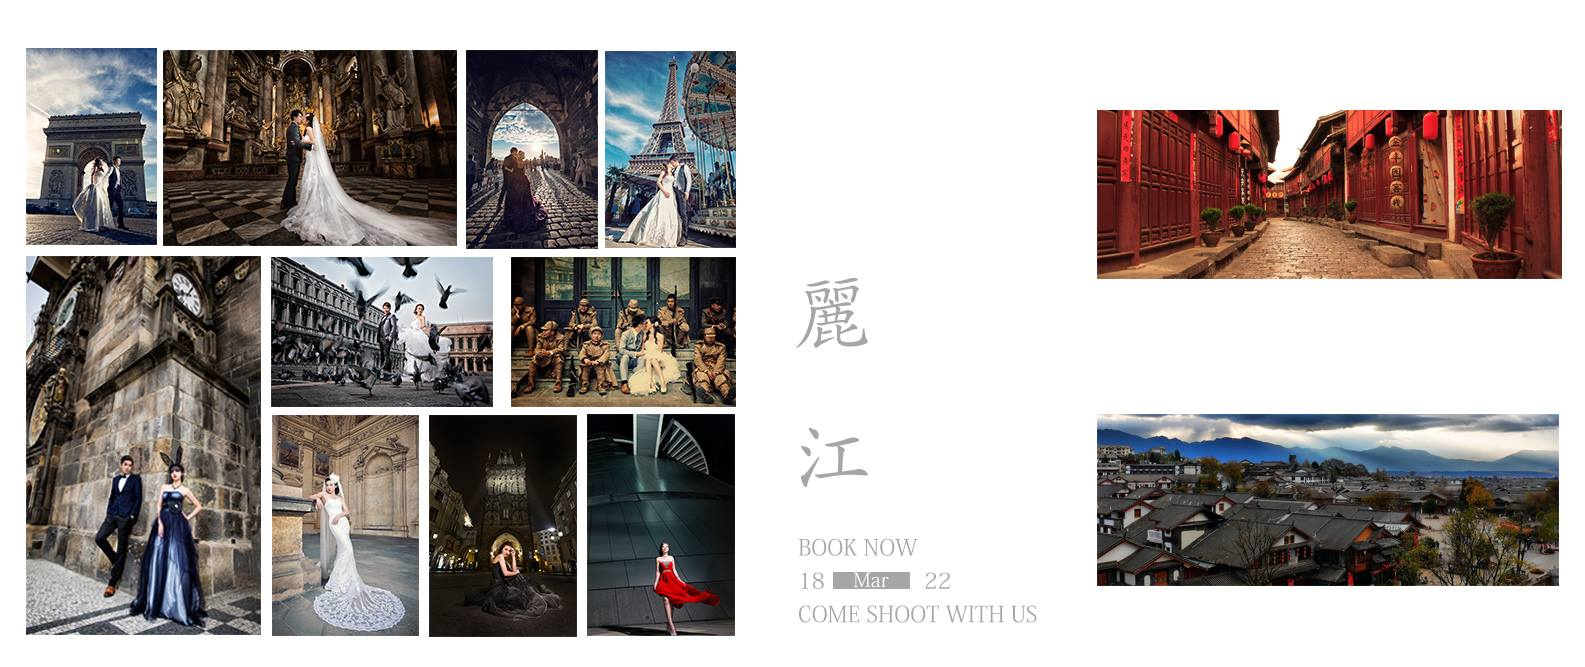 Kel Li Art Gallery - 麗江婚紗攝影 檔期